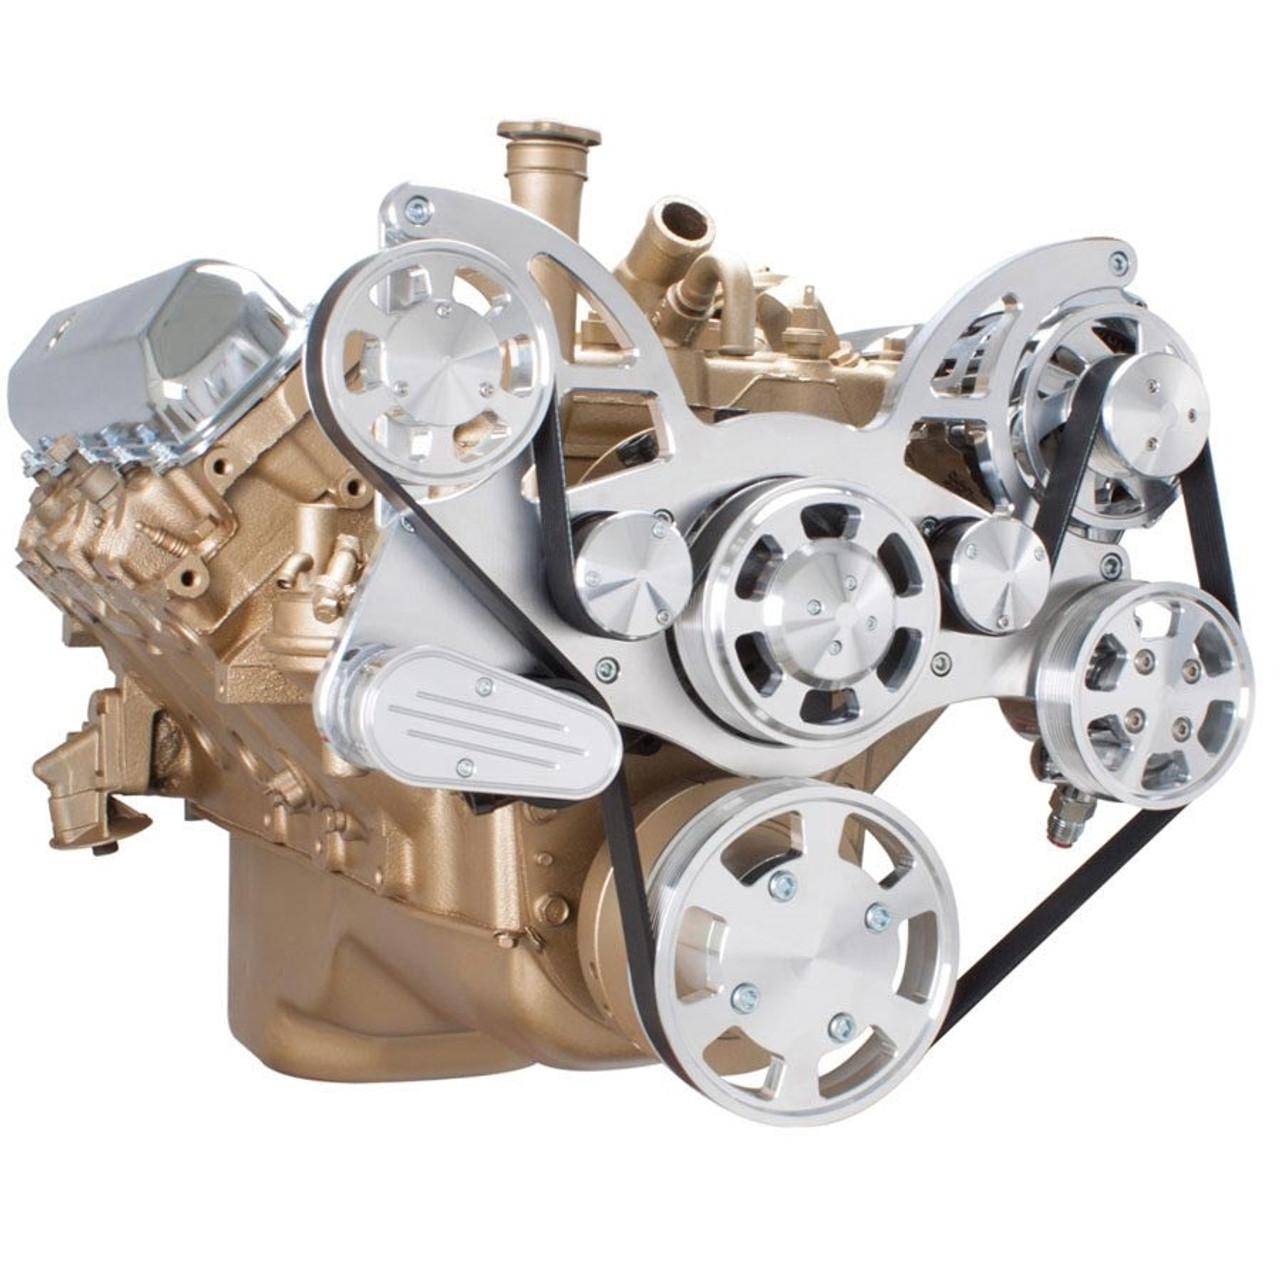 Serpentine Conversion Kit For Oldsmobile 350 455 With Power. Serpentine System For Oldsmobile 350455 Power Steering Alternator. Wiring. 455 Olds Engine Belt Diagram At Scoala.co